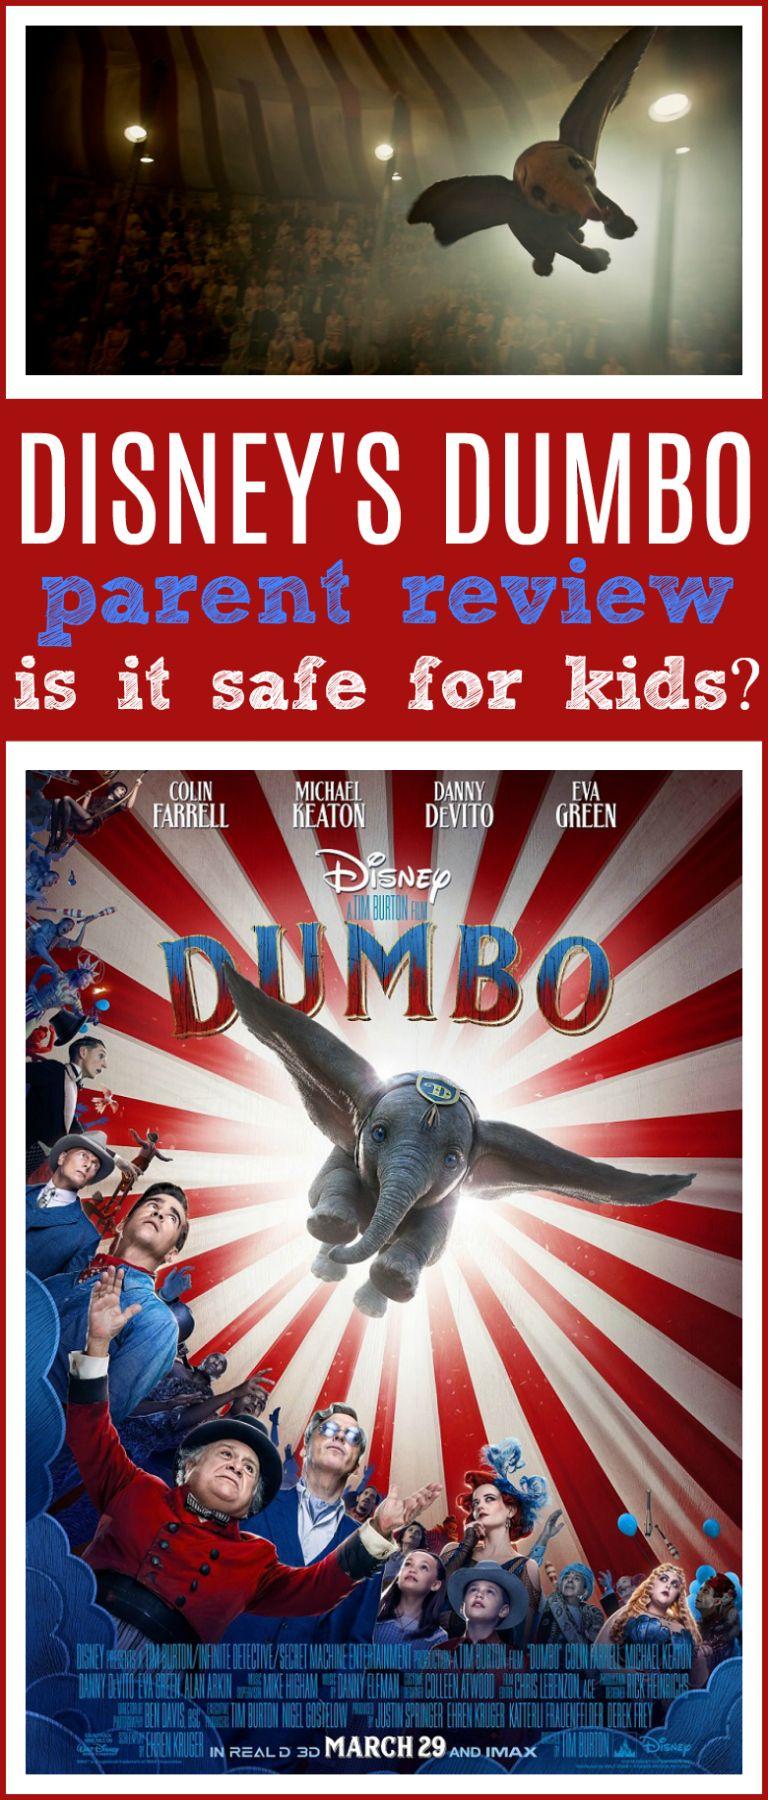 Dumbo Movie Review Dumbo movie, Disney live action films